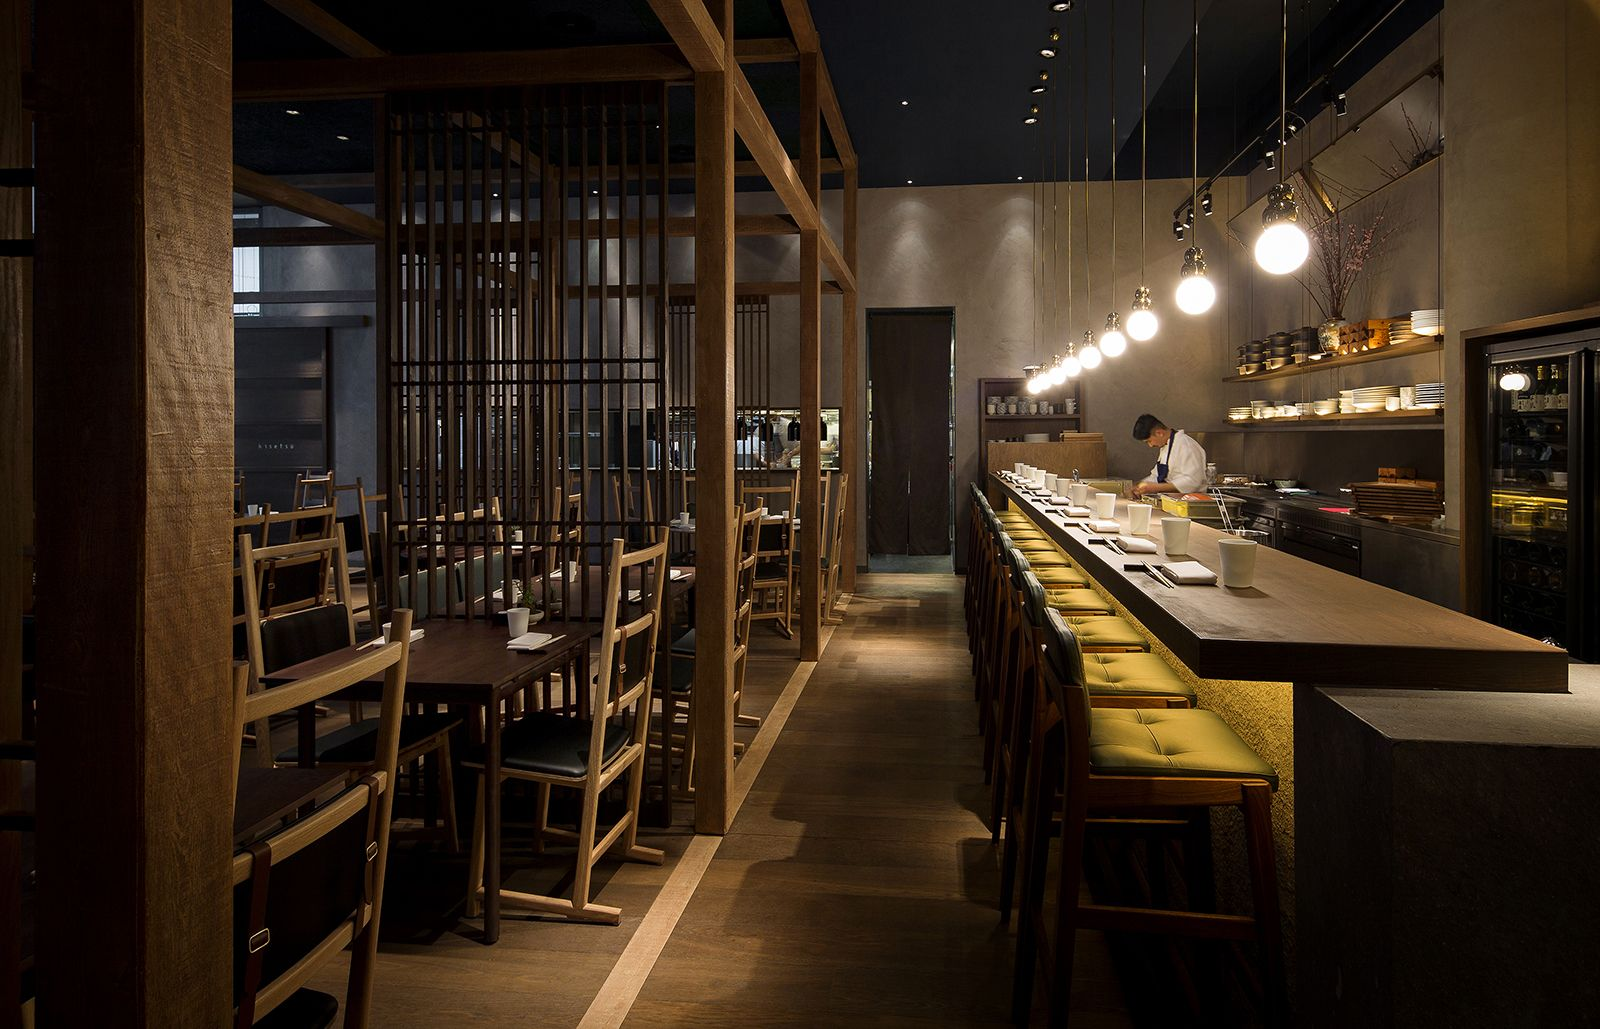 Neri & Hu design a Japanese izakaya for Jason Atherton's new restaurant in  London - The Spaces